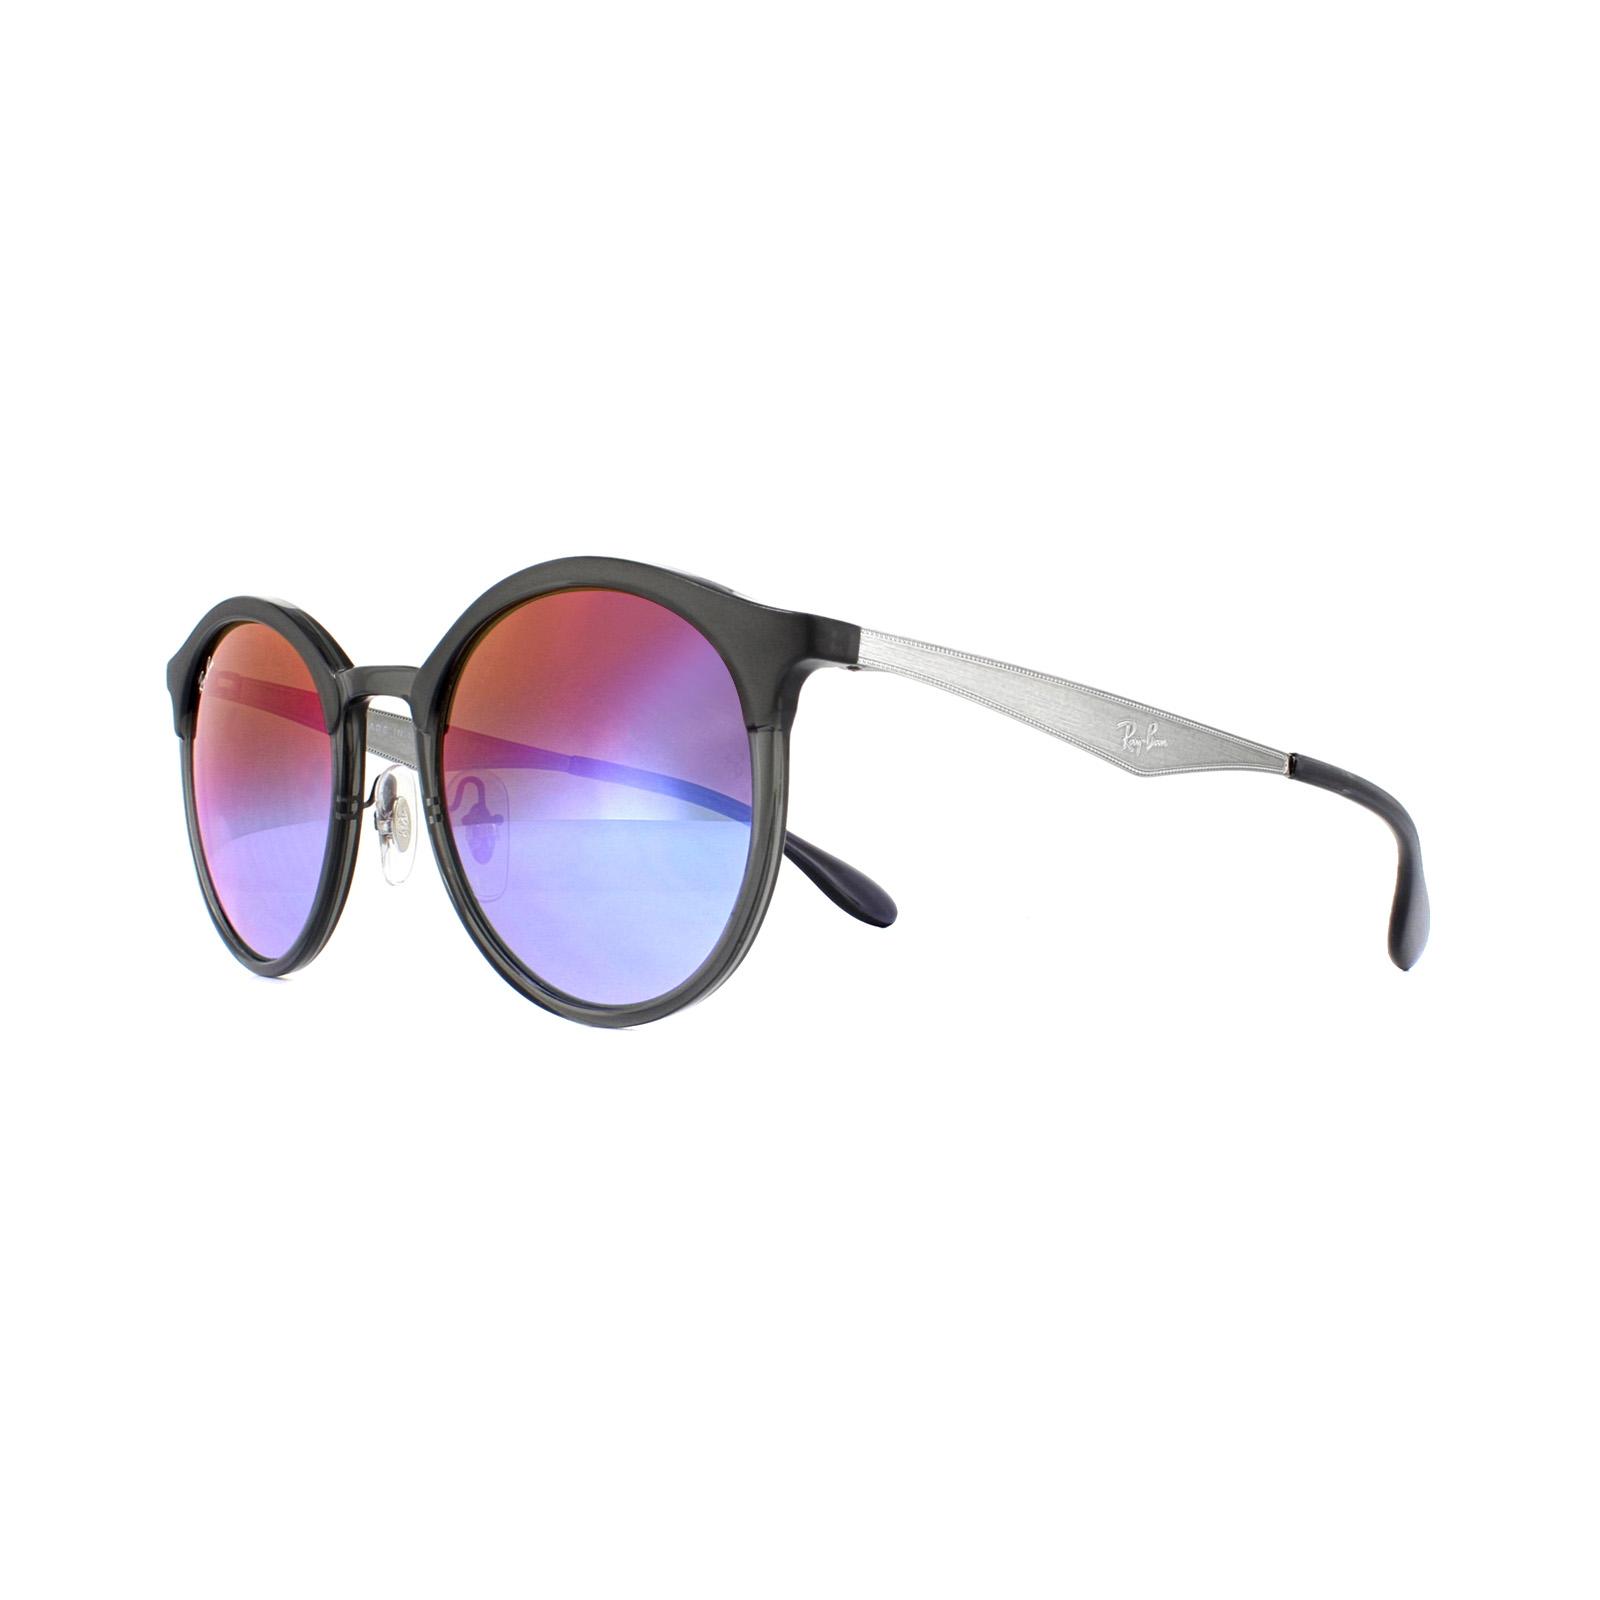 a5b4d8f028d Sentinel Ray-Ban Sunglasses Emma RB4277 6324B1 Grey Gunmetal Blue Violet  Gradient Mirror